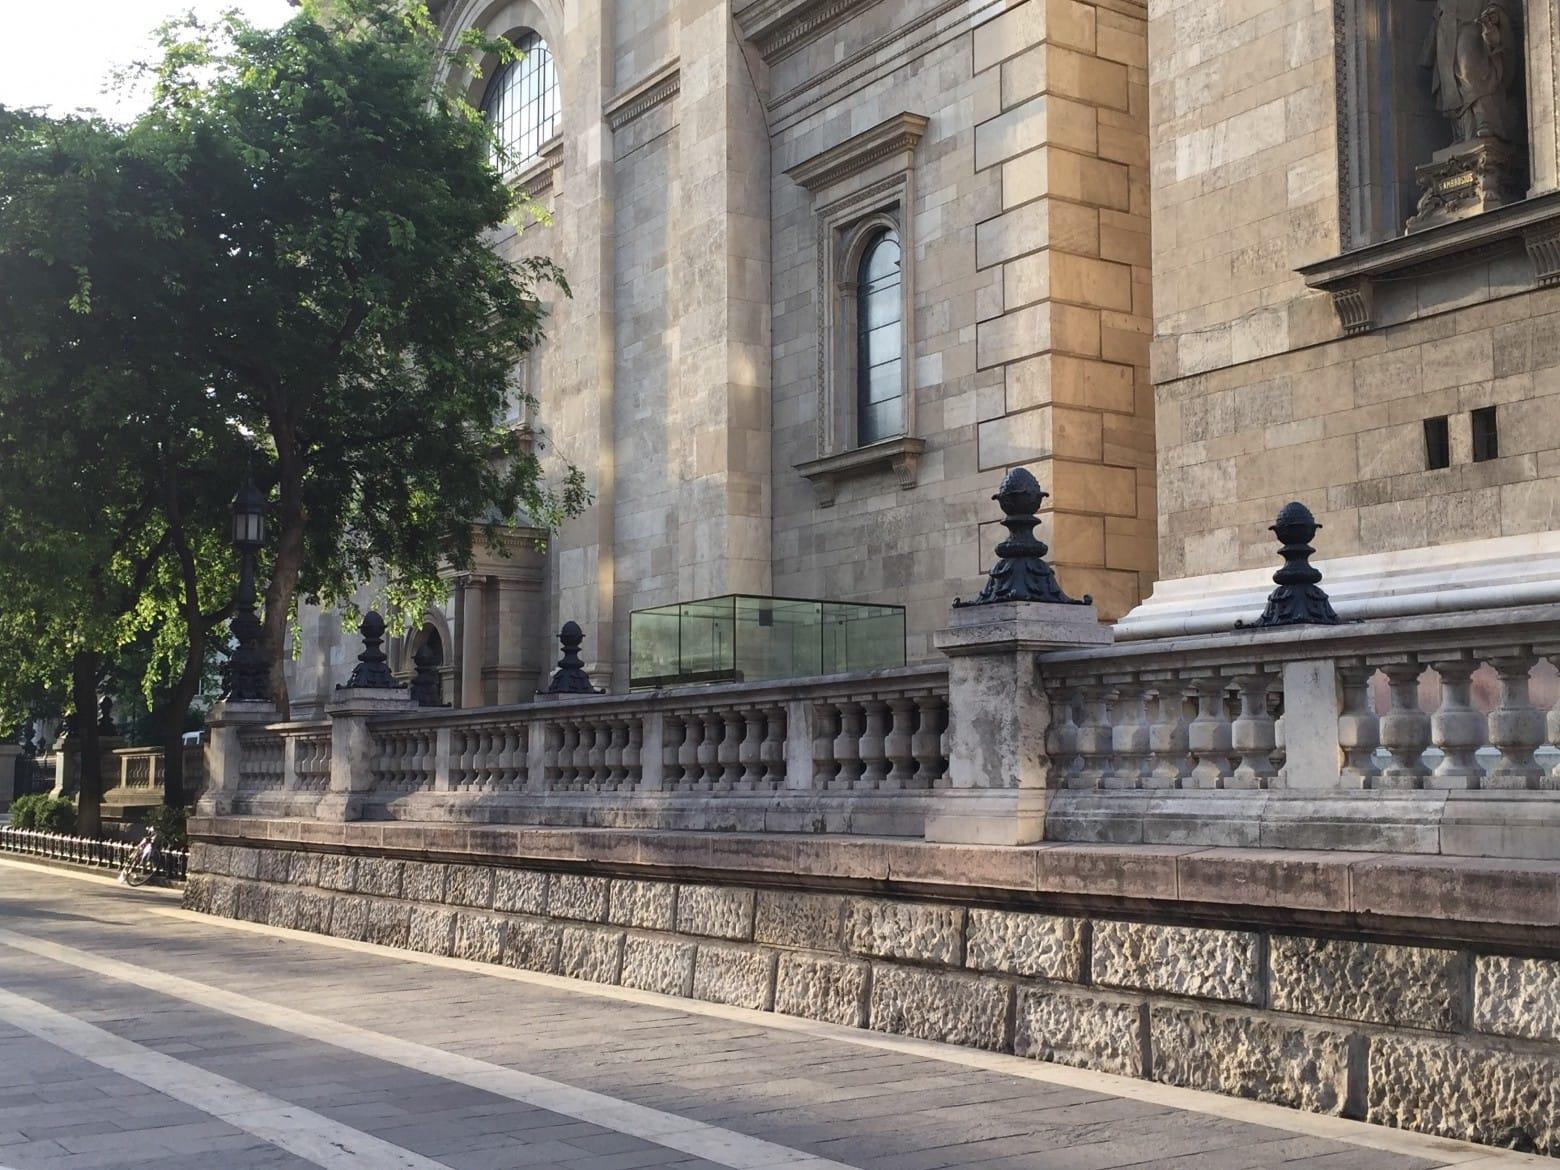 Bazilika_terasz_setany_felvono_foto_utca